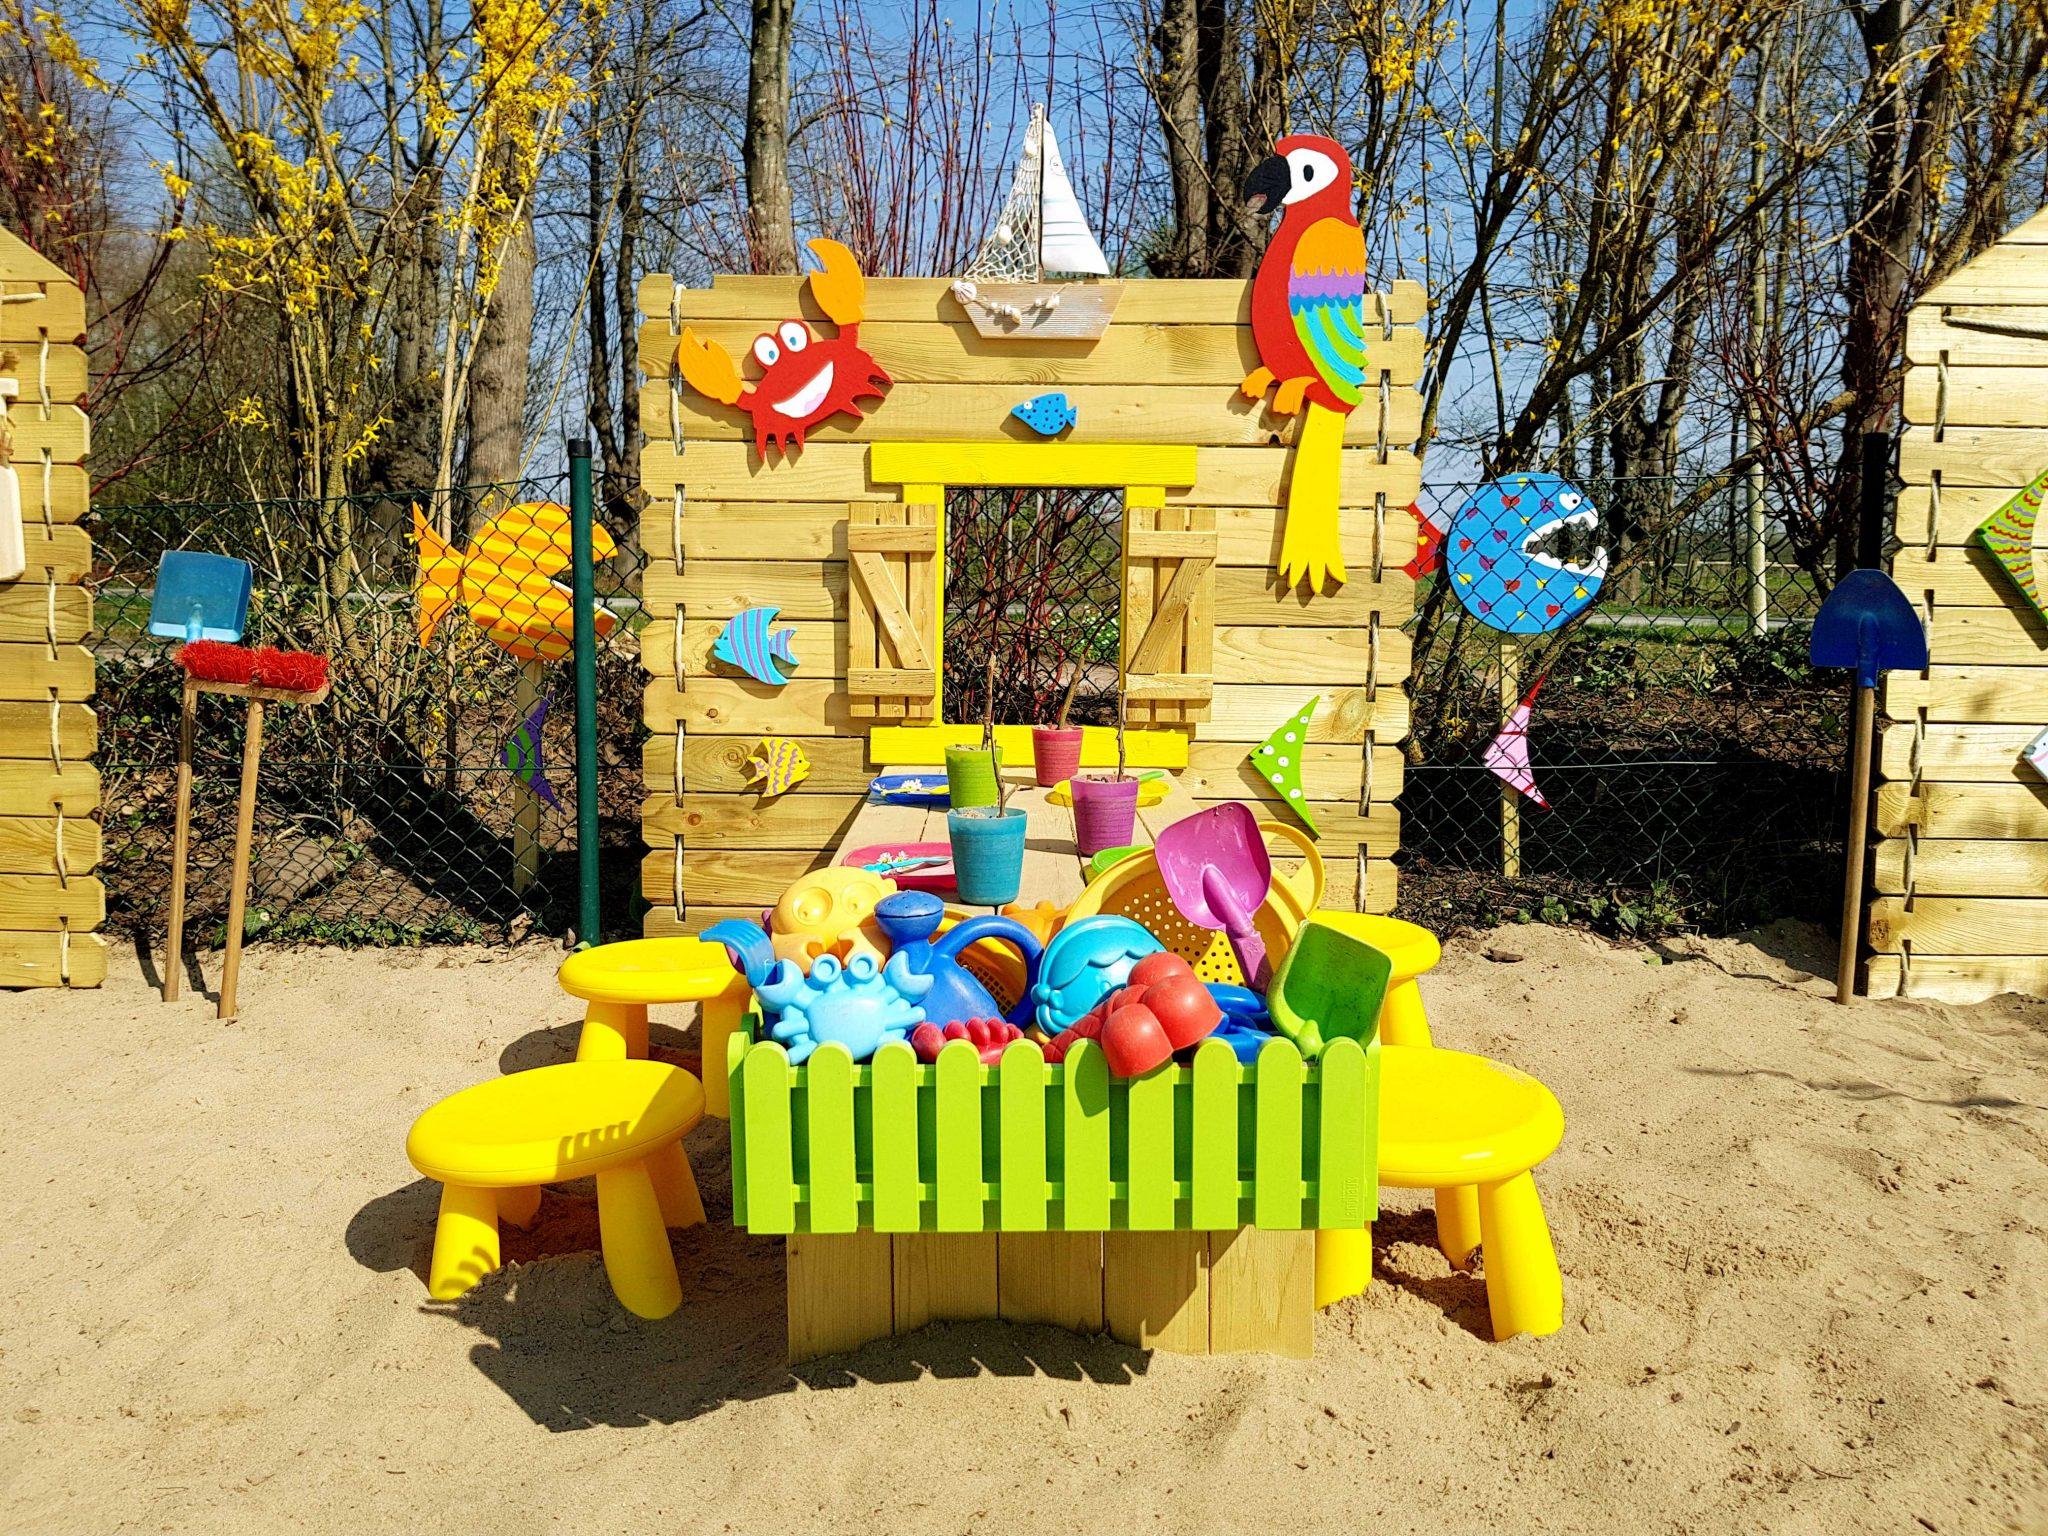 Kita Kid Zone Kinderbetreuung Garten1 20 - Kita Kid Zone Kinderbetreuung für 0-3 Jahre in Jersbek